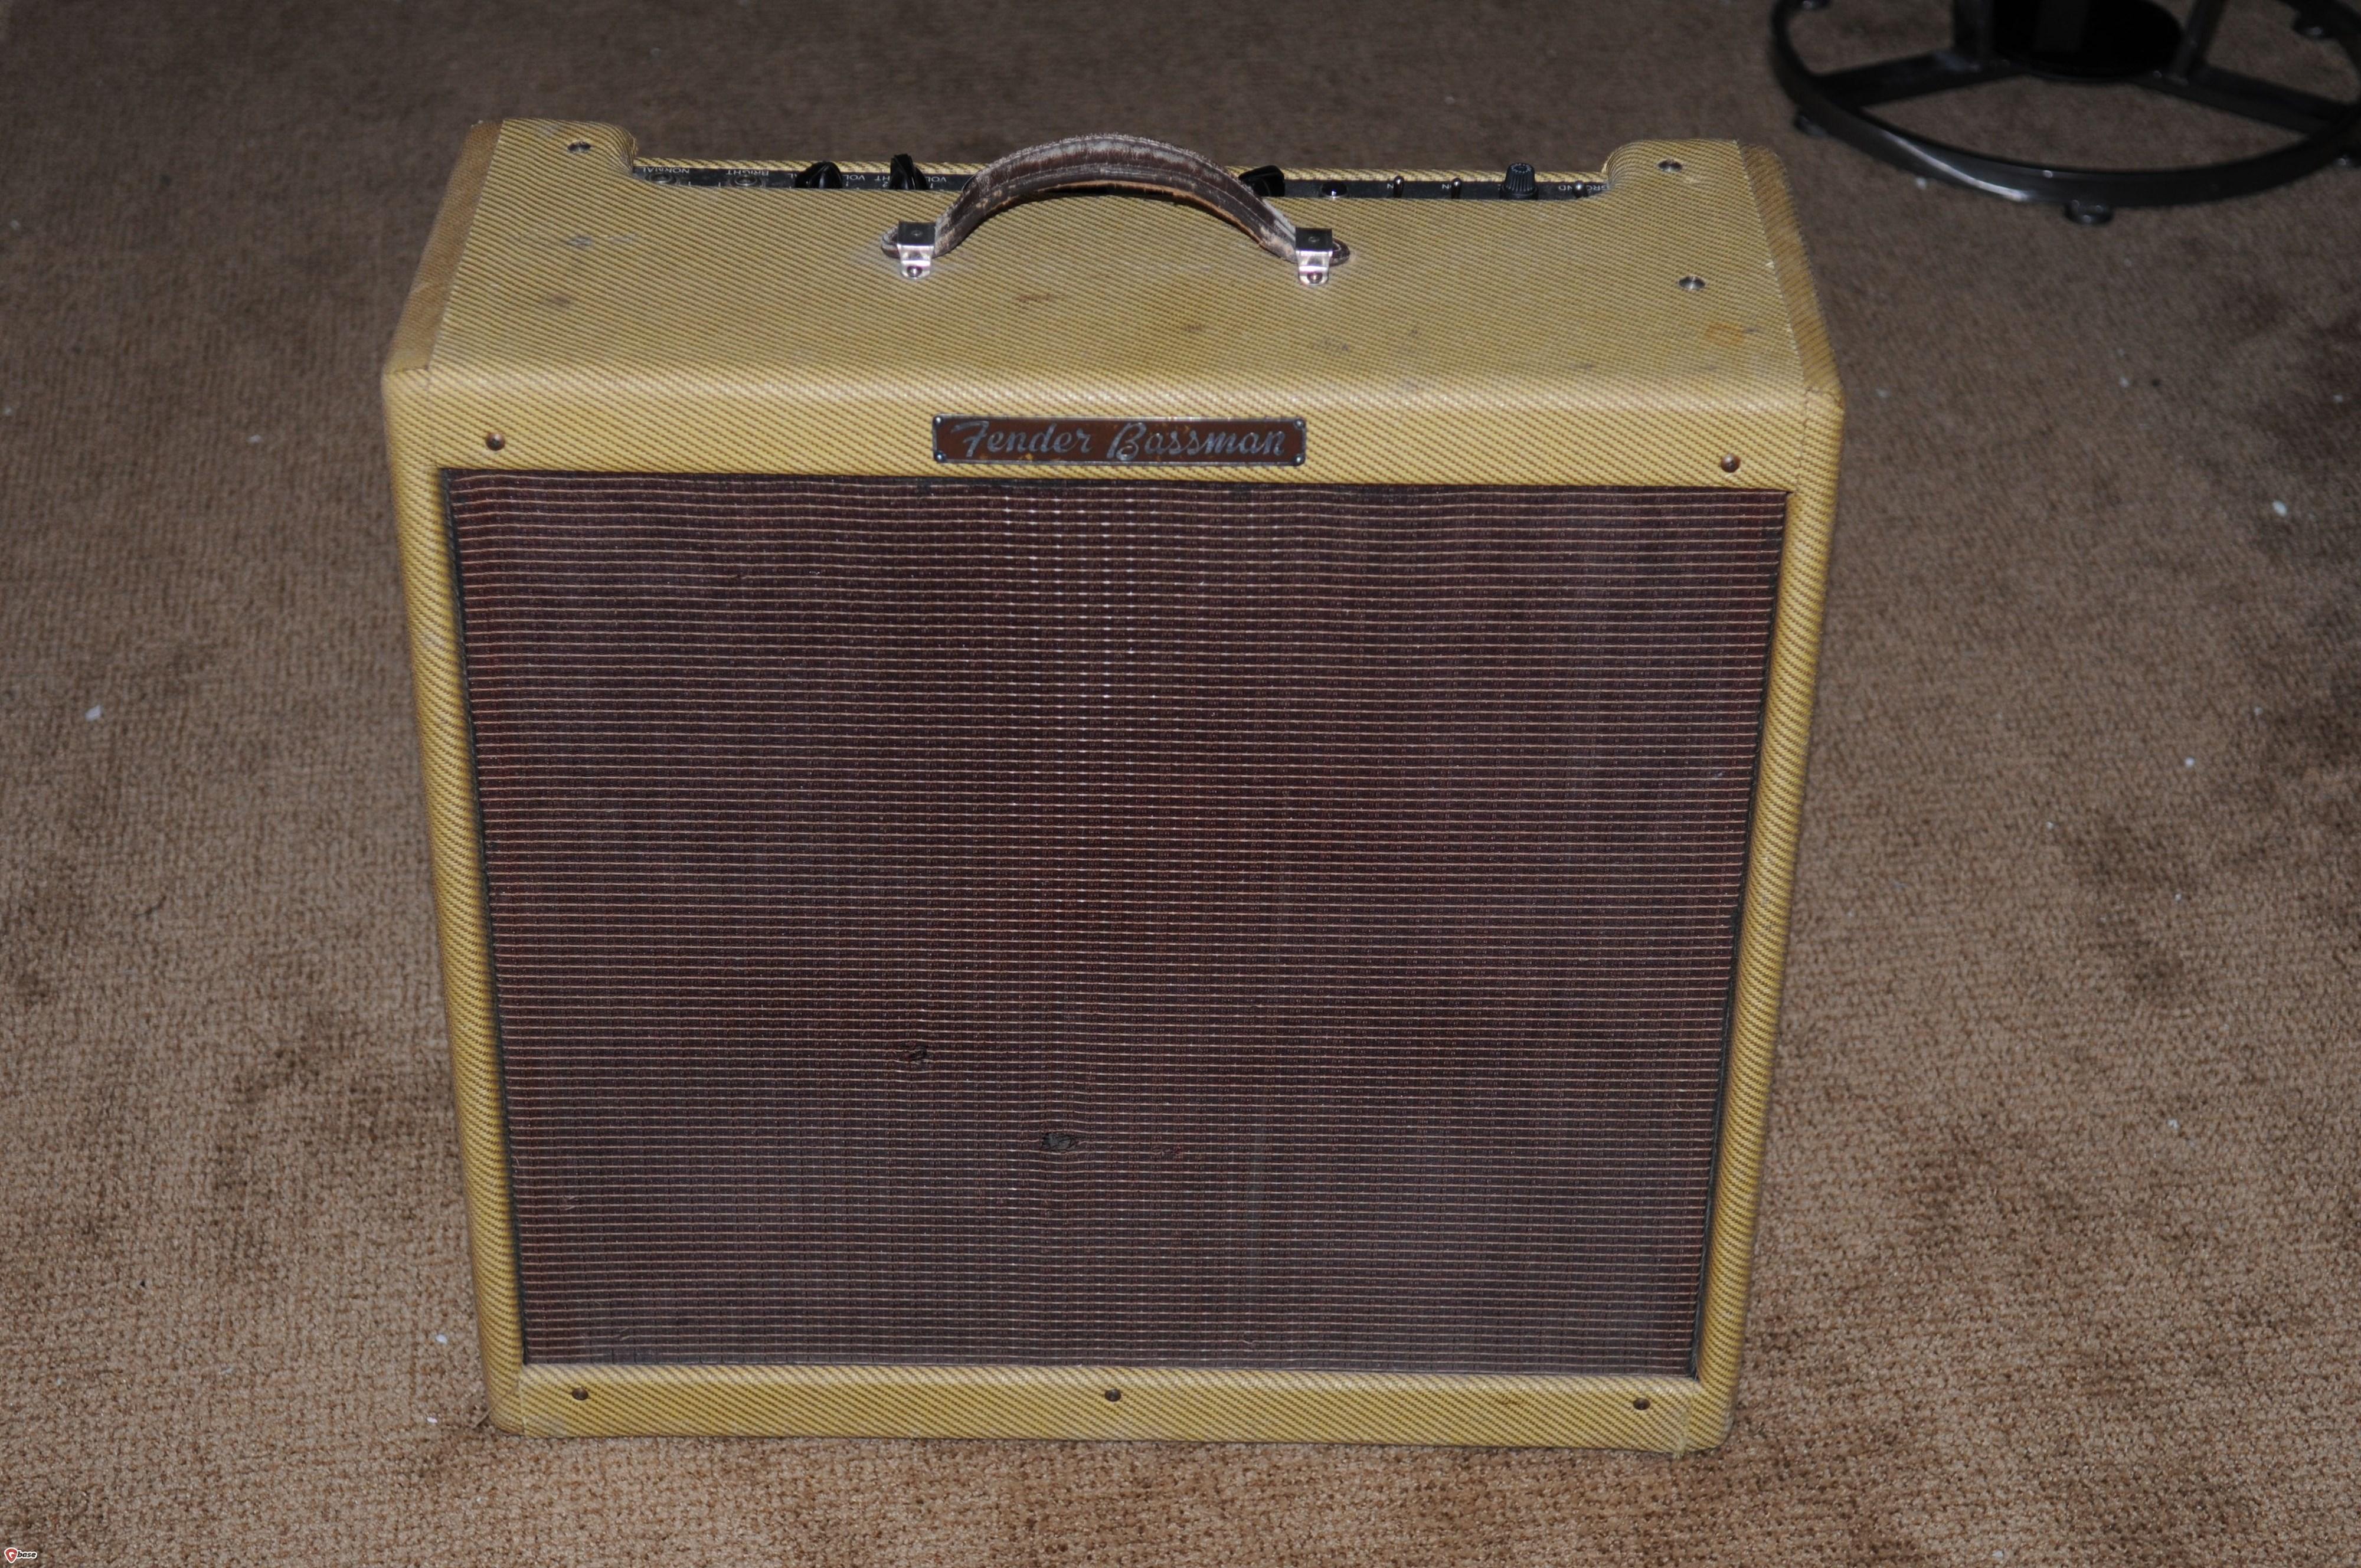 1959 Fender® VINTAGE (not reissue) 59 Bassman® BUGS HENDERSON Owned